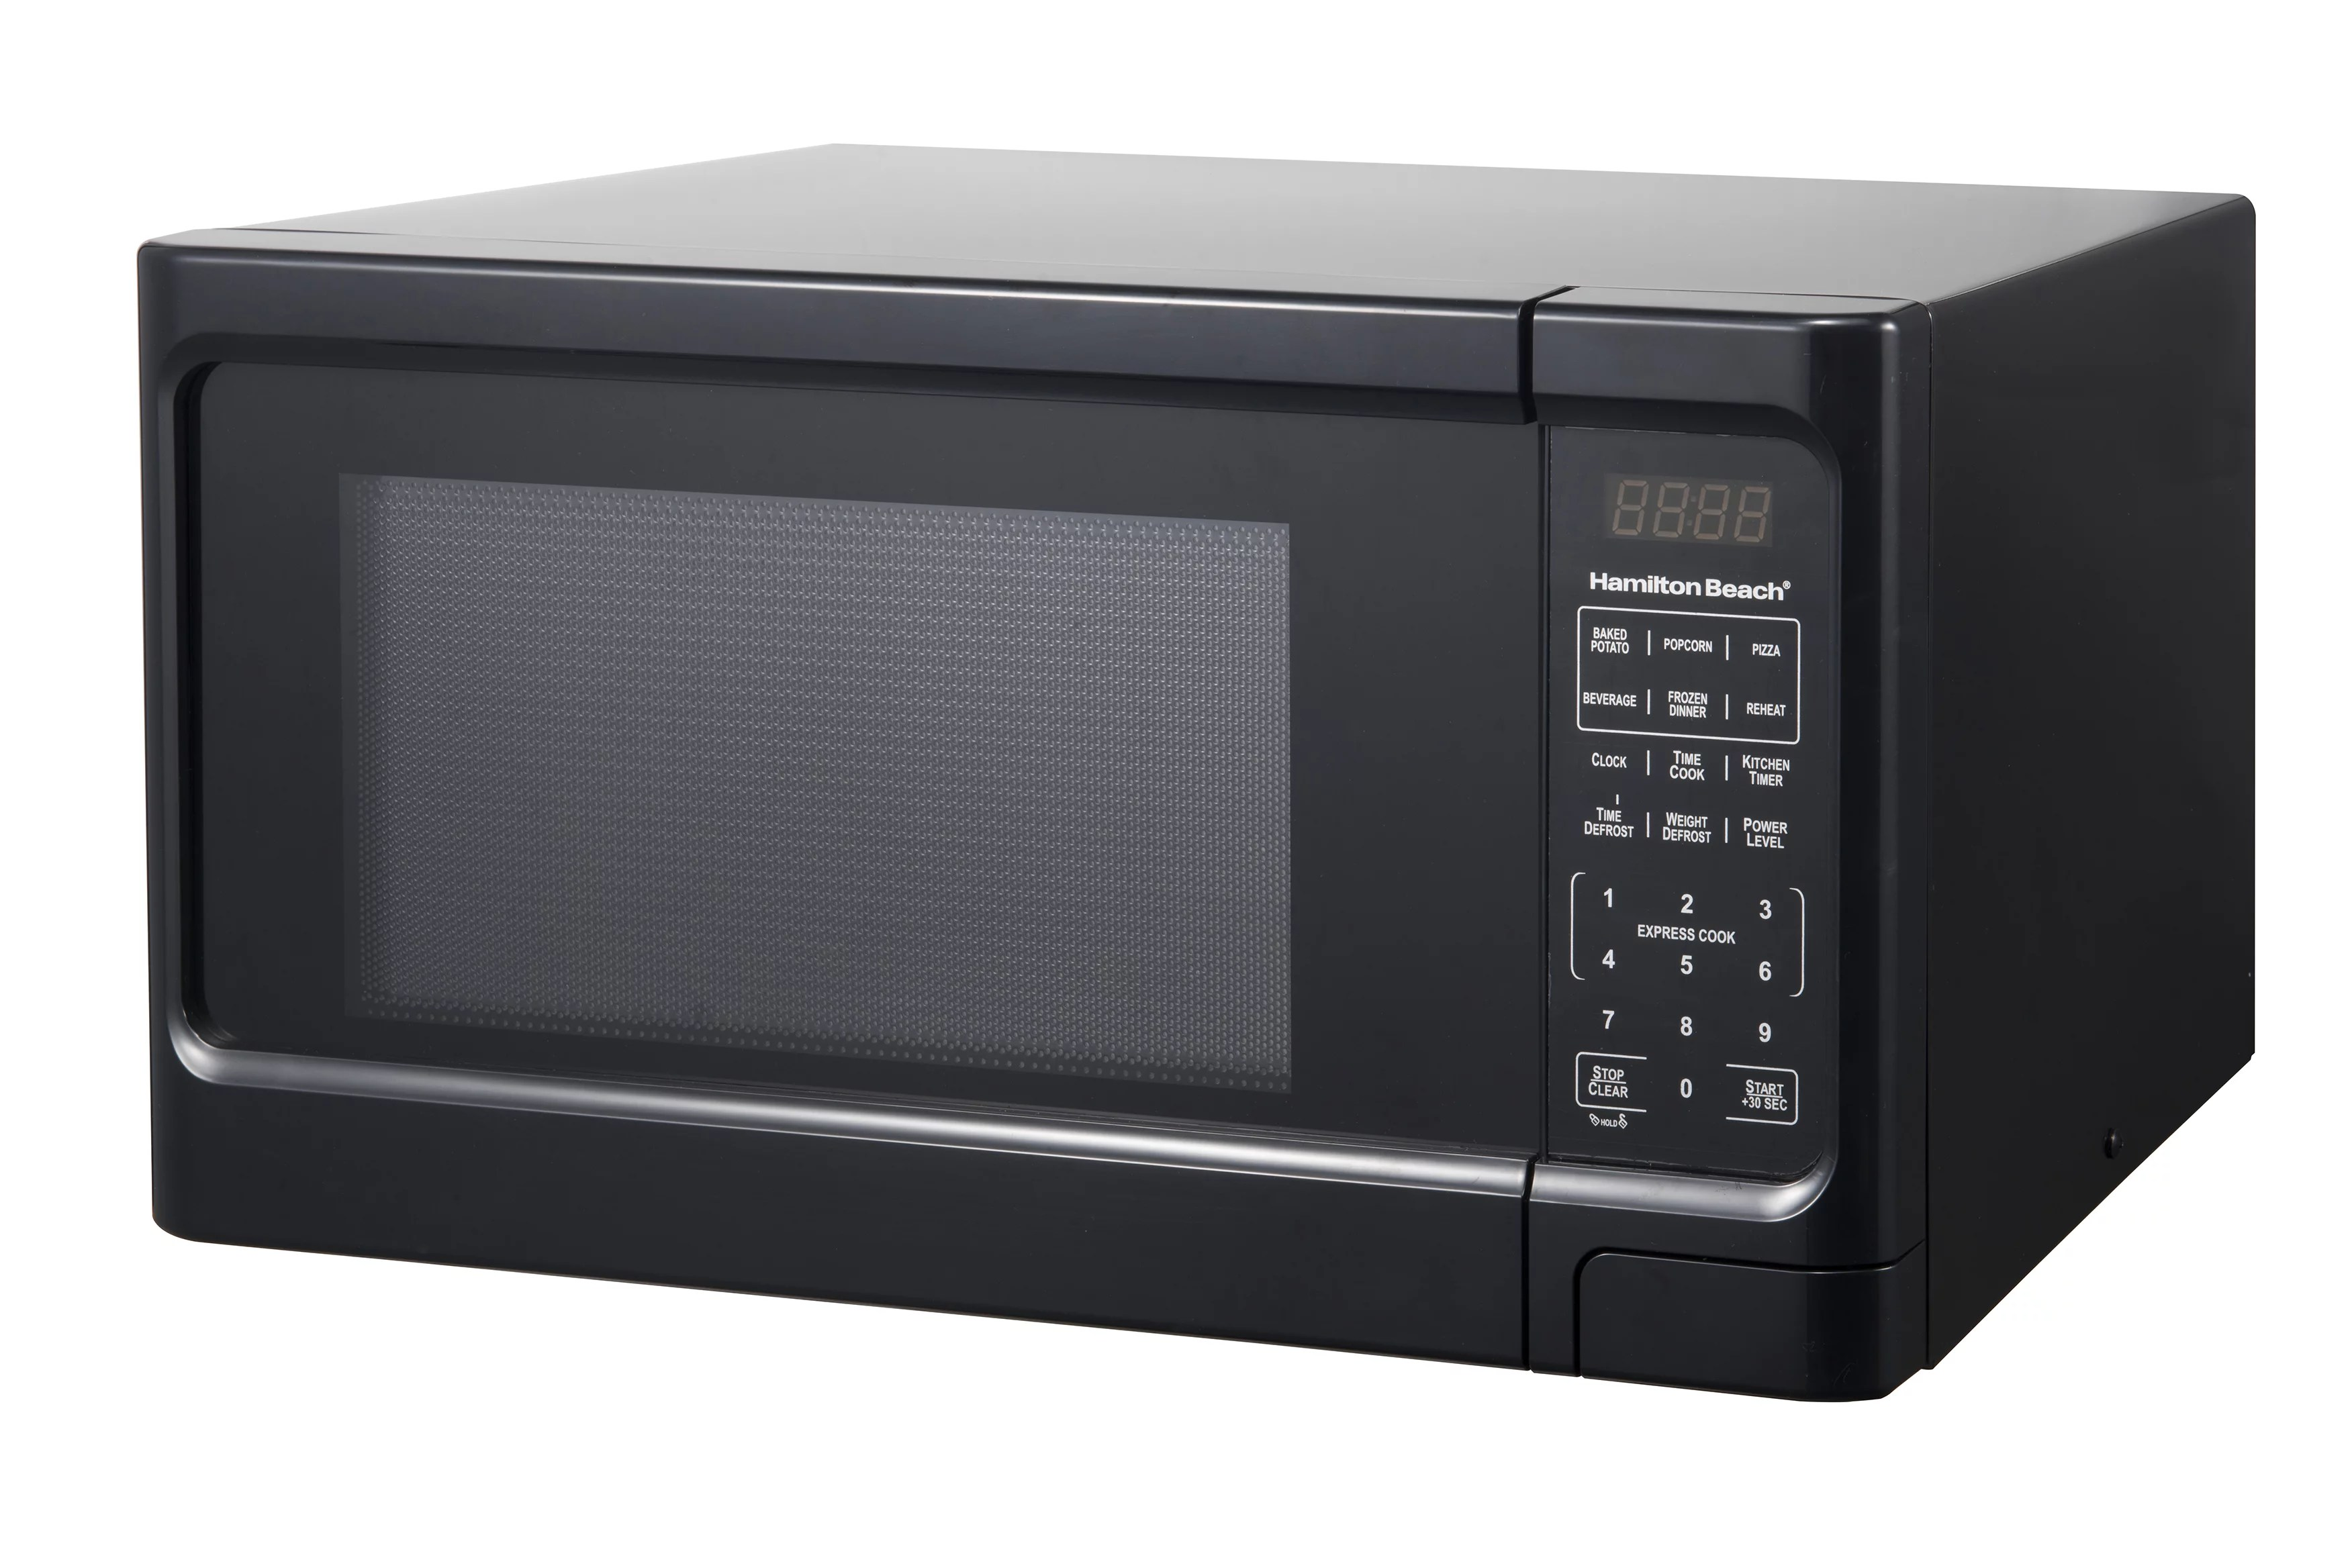 hamilton beach 1 1 cu ft black digital microwave oven